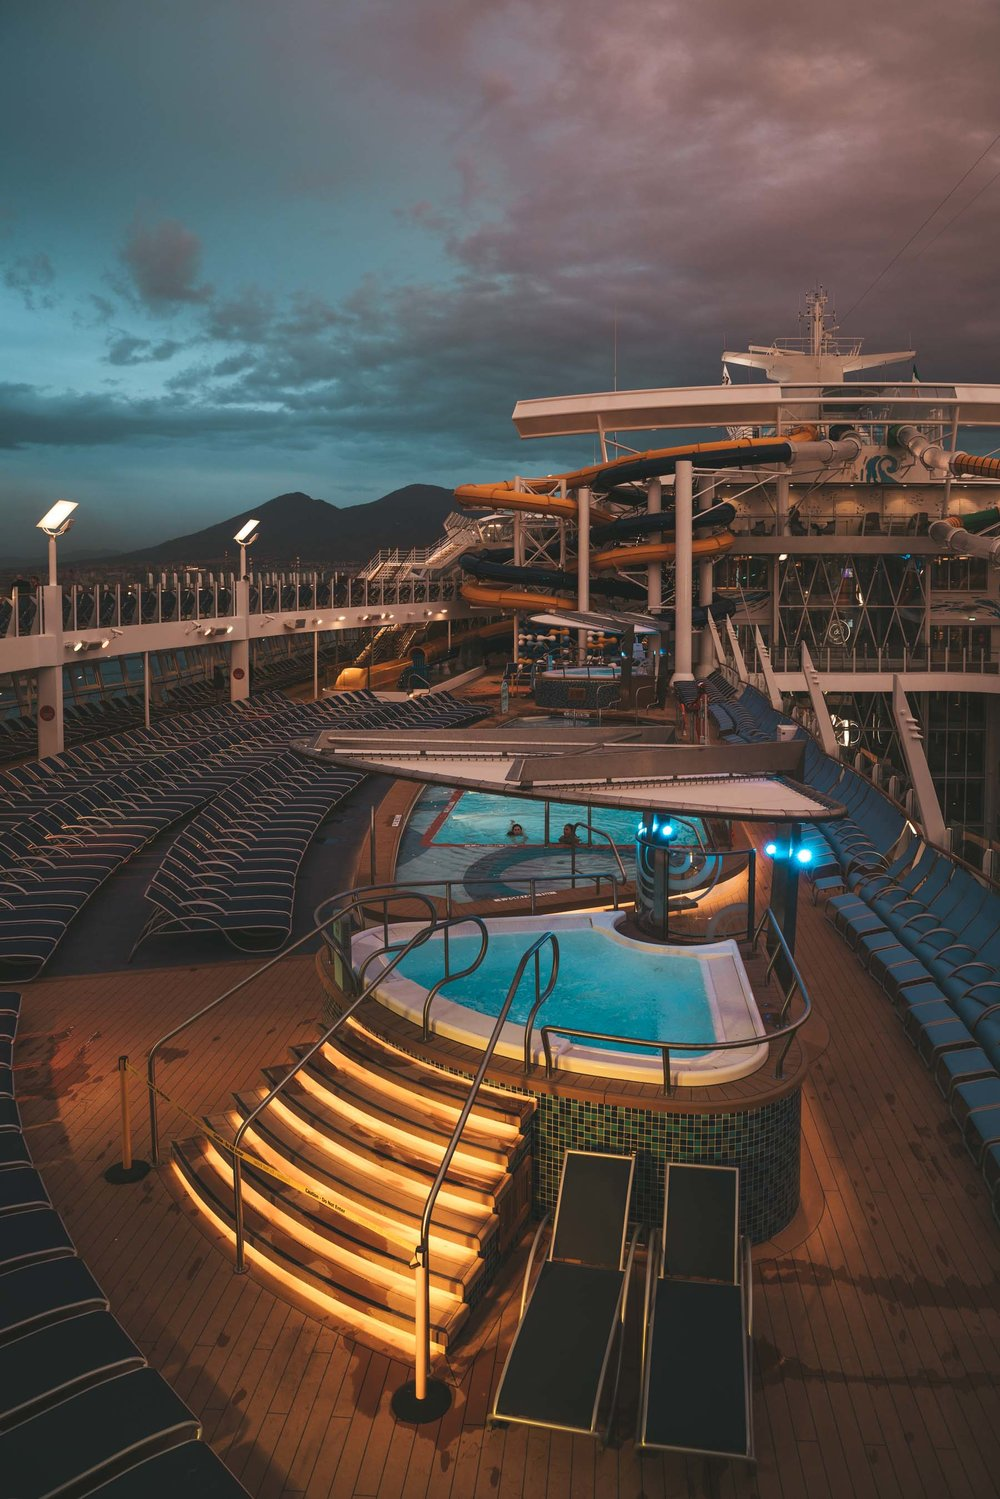 Symphony of the Seas with Royal Caribbean - Madeline Lu-6.jpg